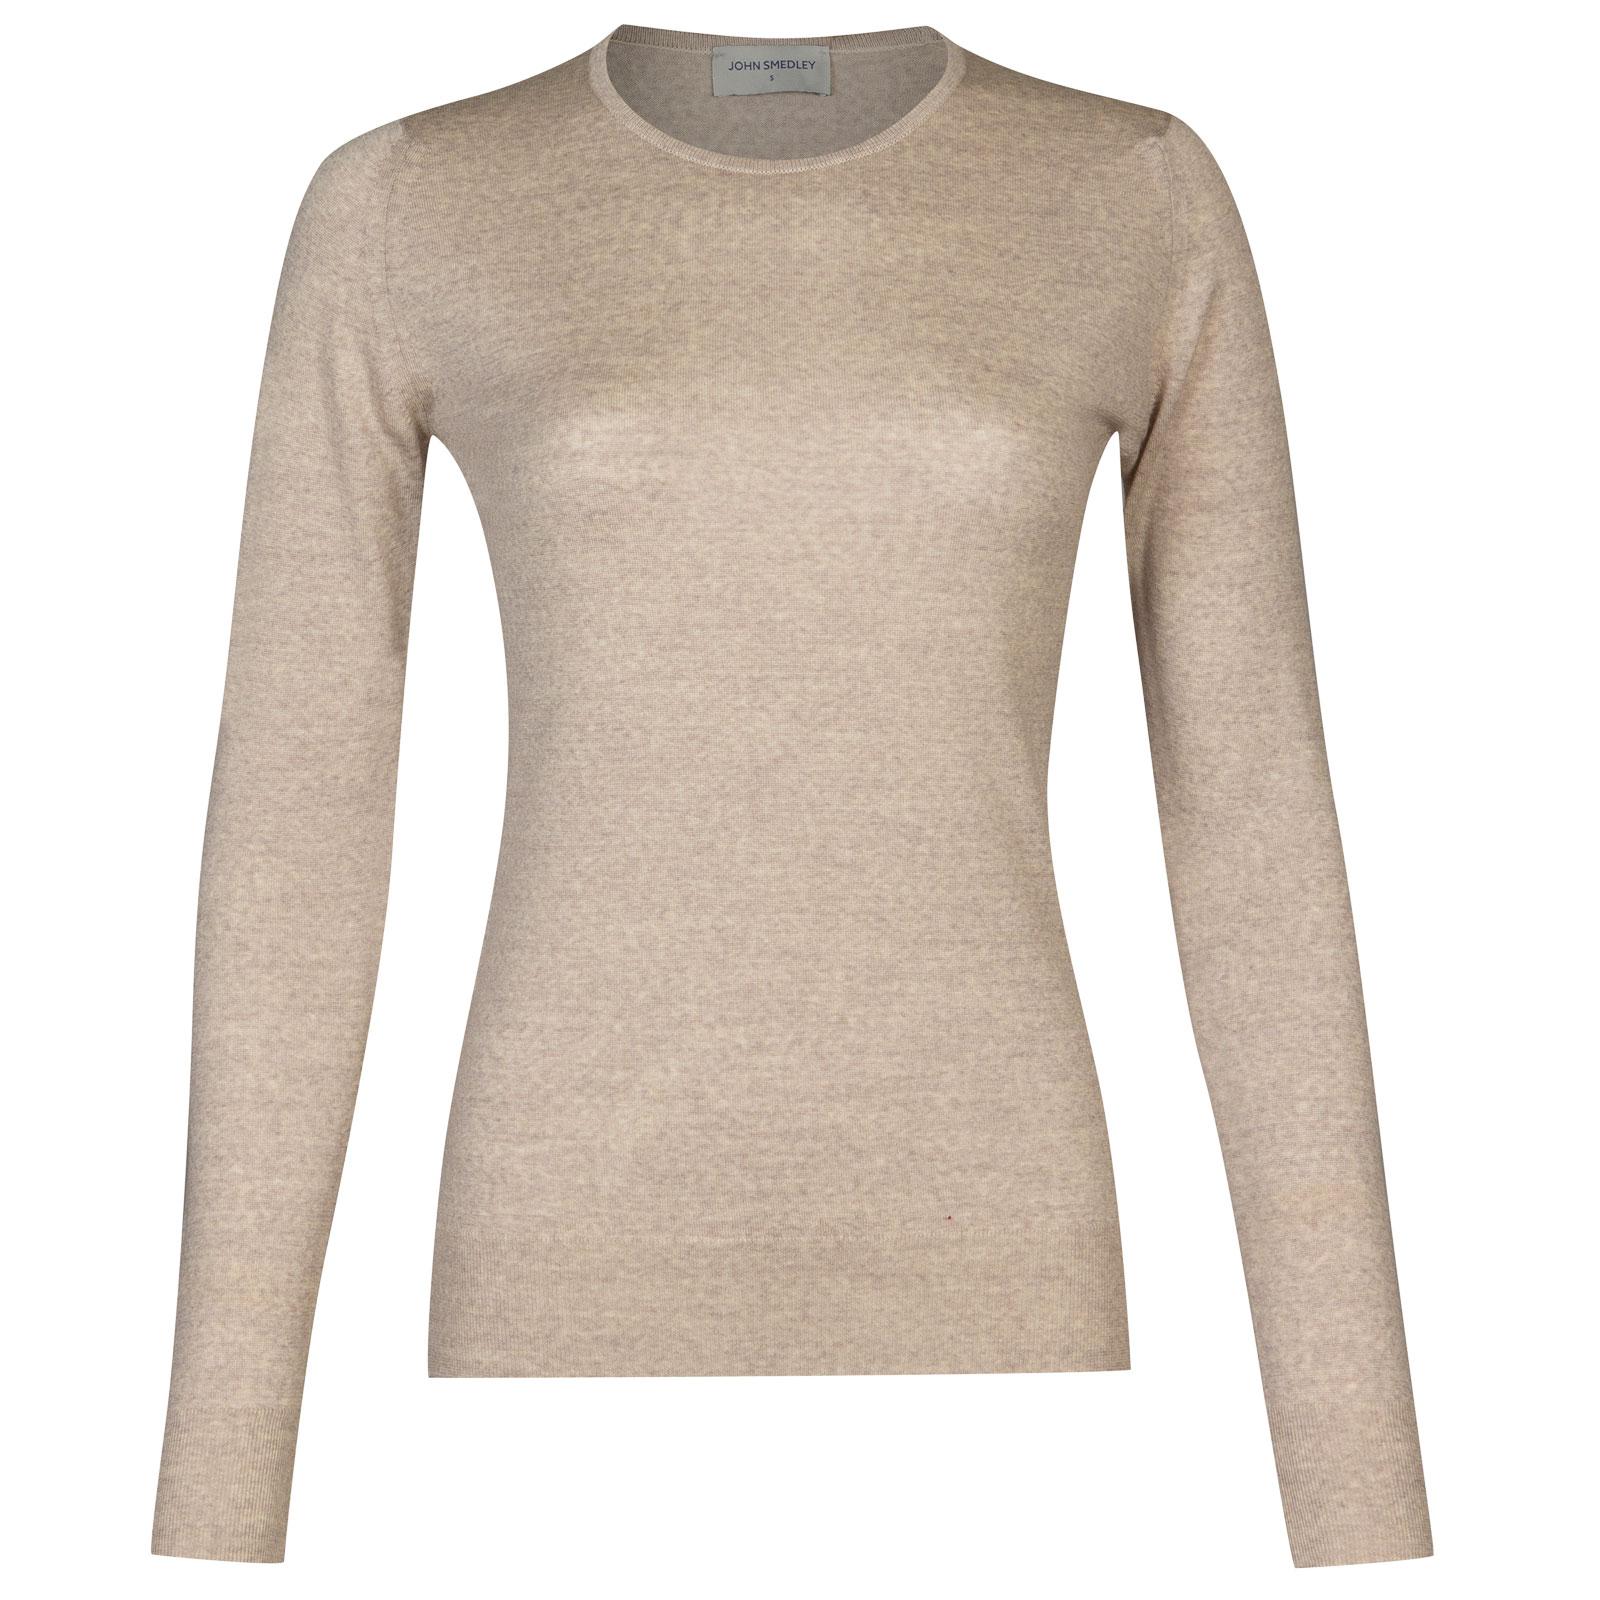 John Smedley geranium Merino Wool Sweater in Eastwood Beige-XL